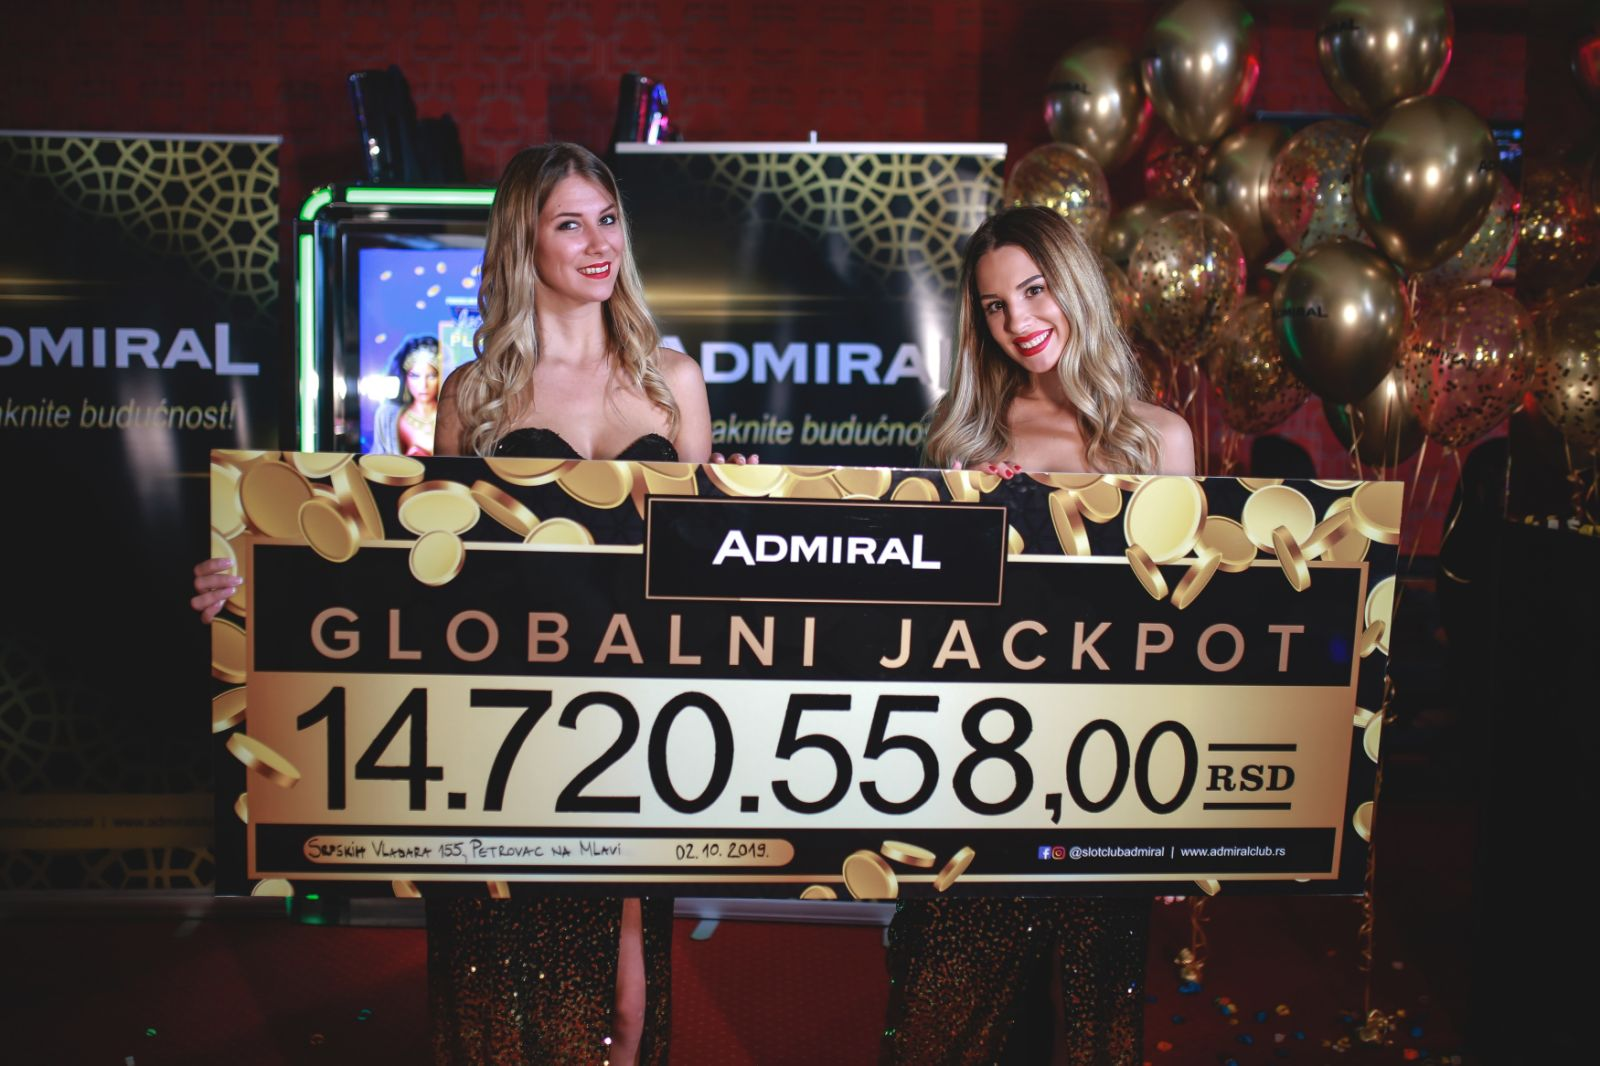 Osvojen je ADMIRAL globalni jackpot!